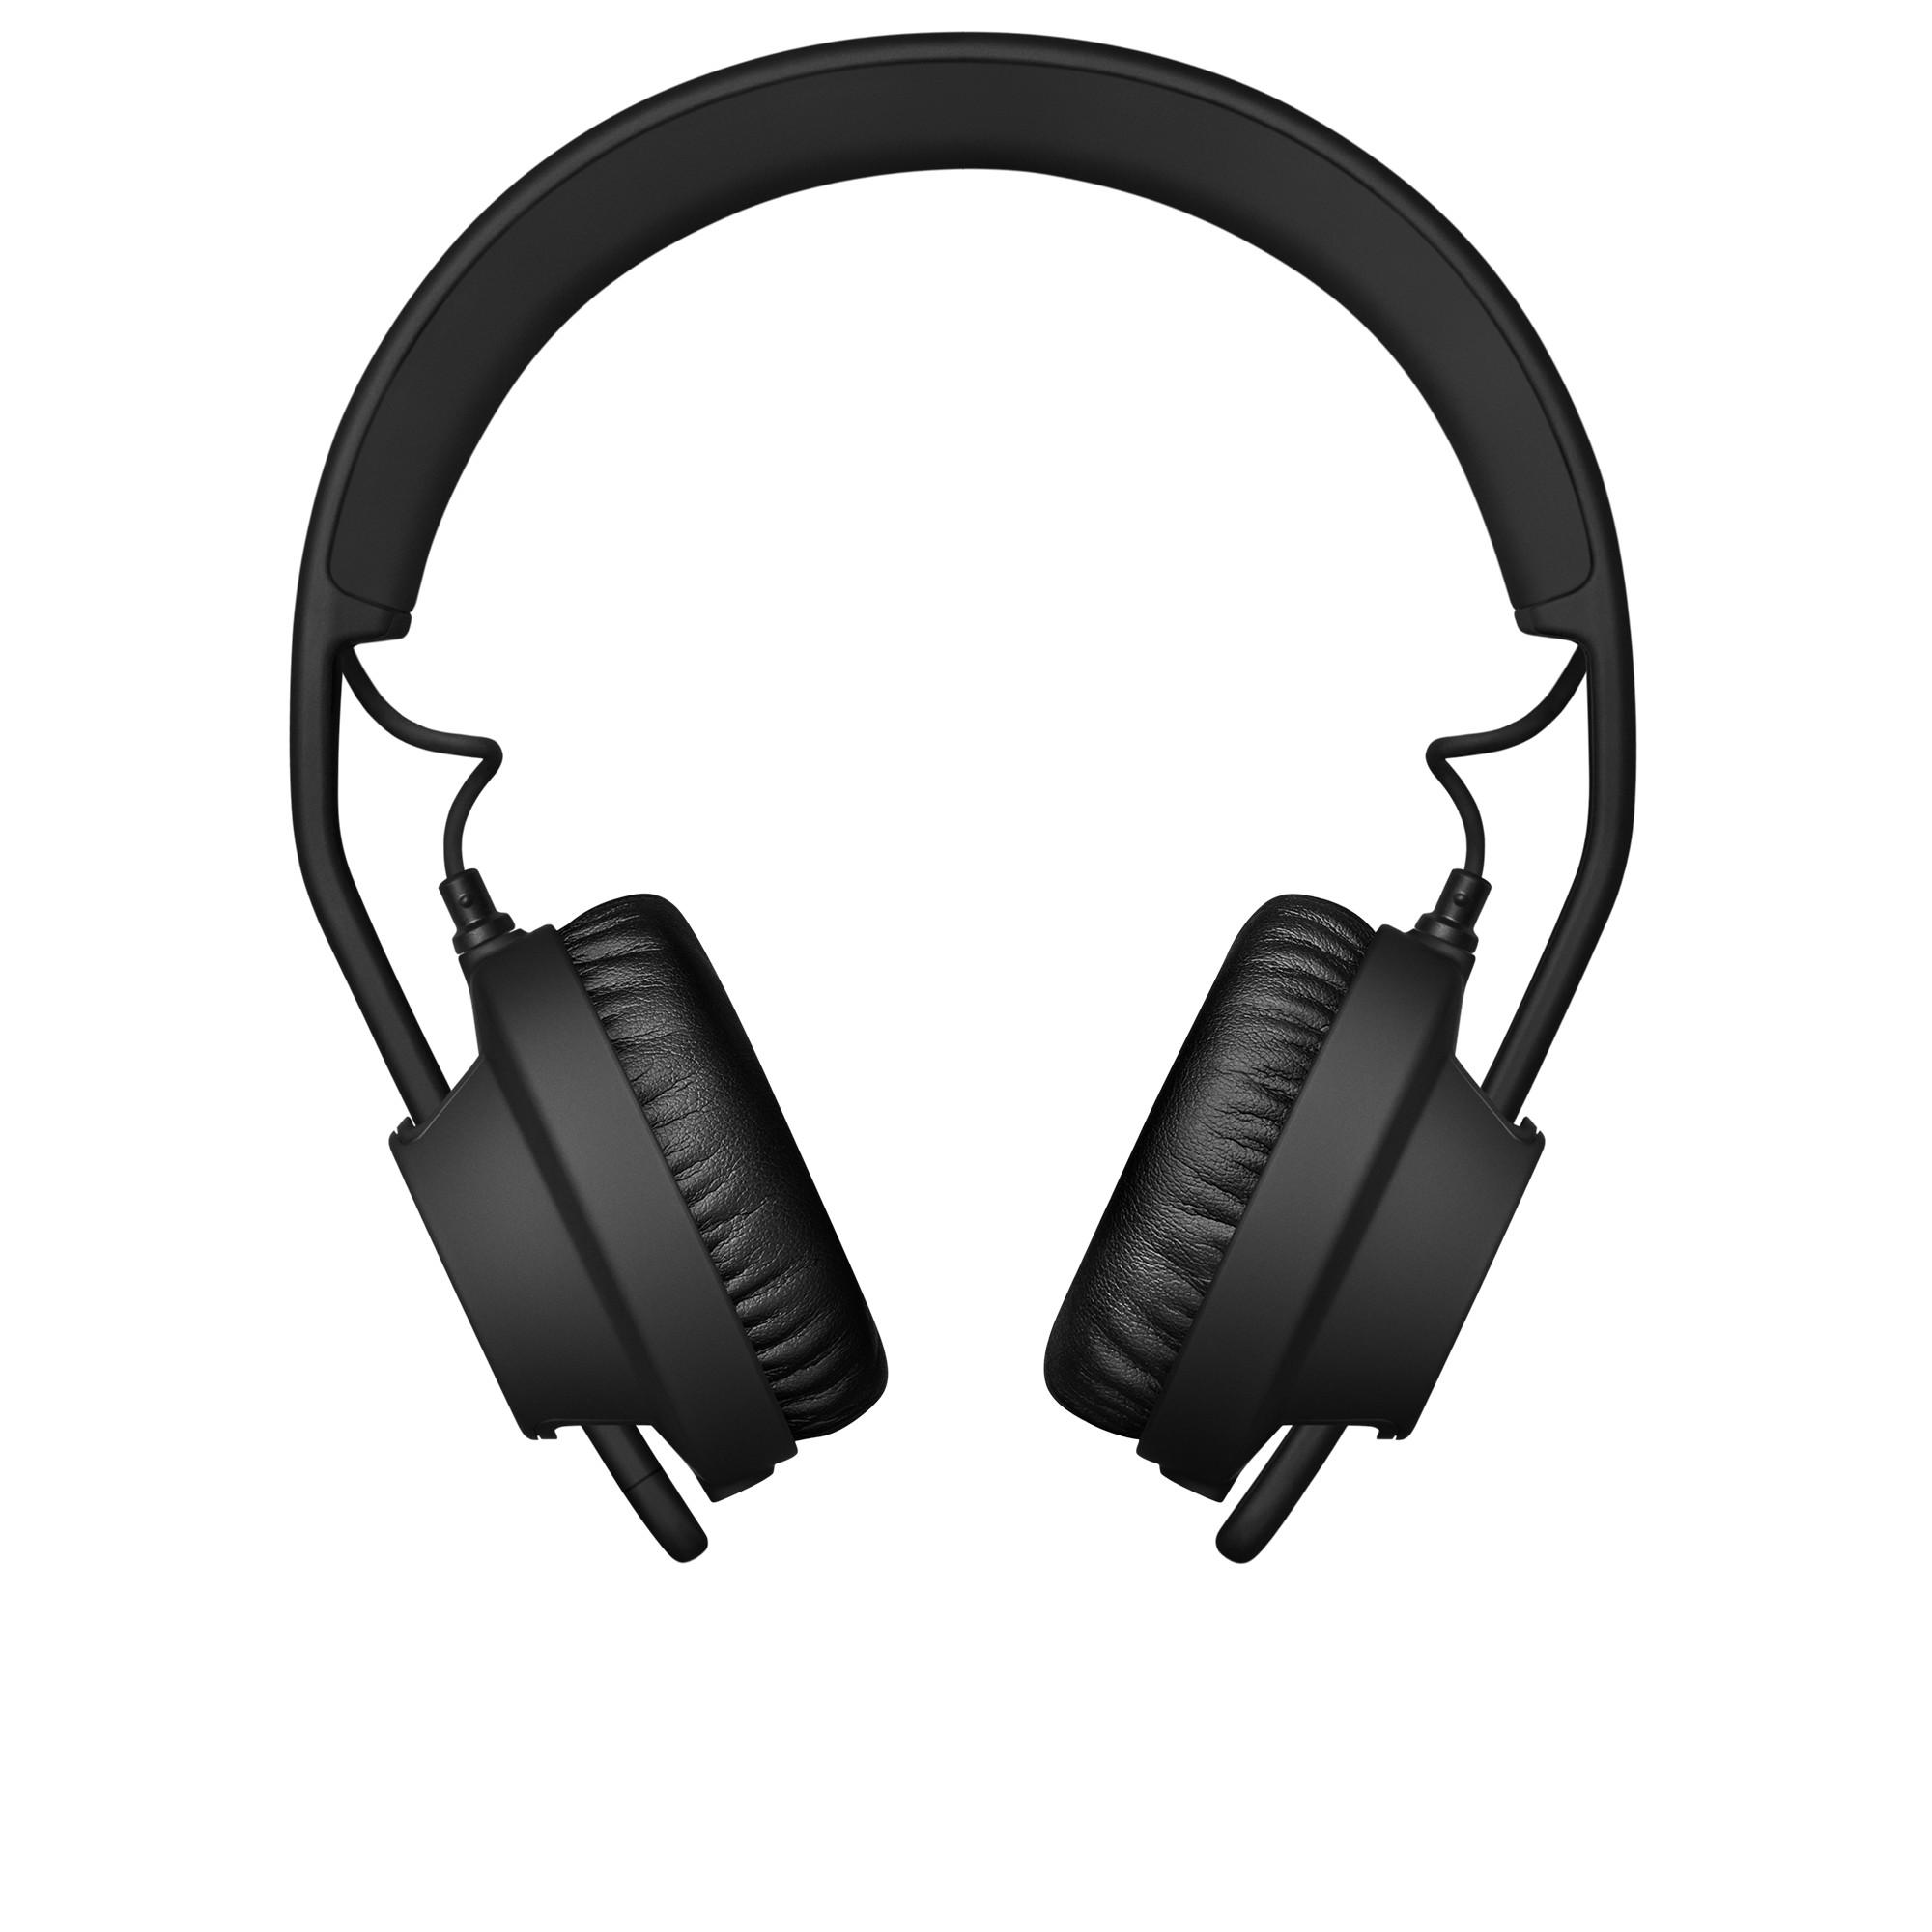 Aiaiai TMA-2 Modular MFG7 Wireless DJ Made for google